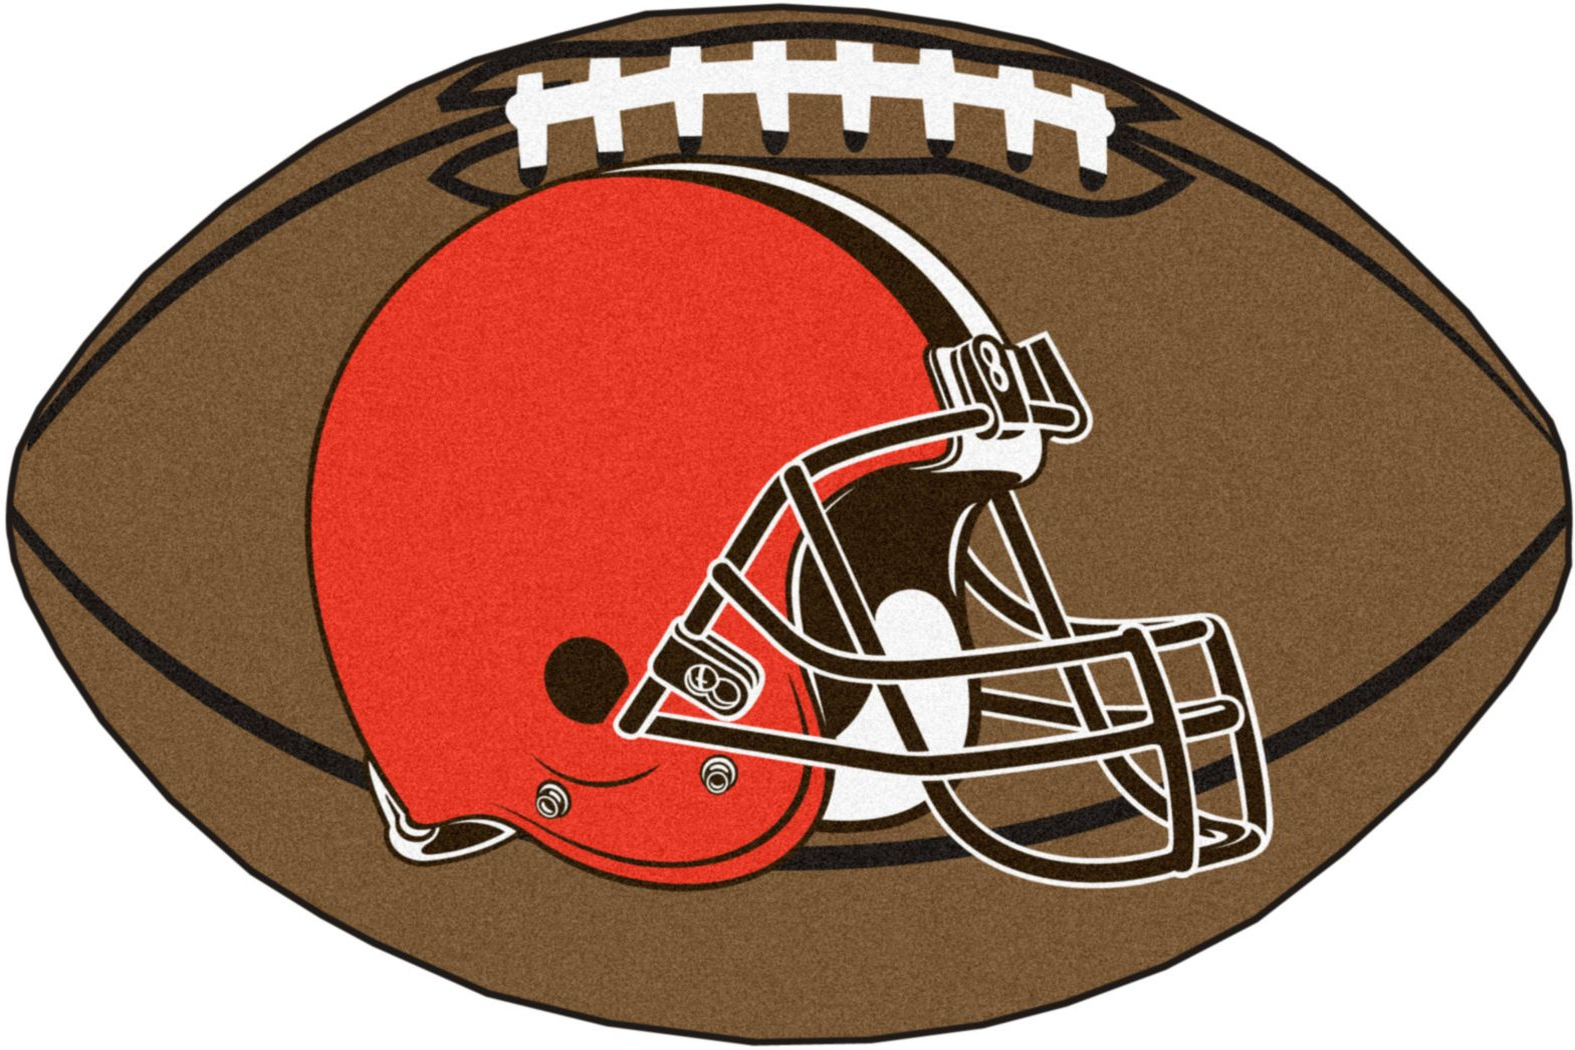 "NFL Football Mascot Cleveland Browns 1'6""x 1'10"" Rug"